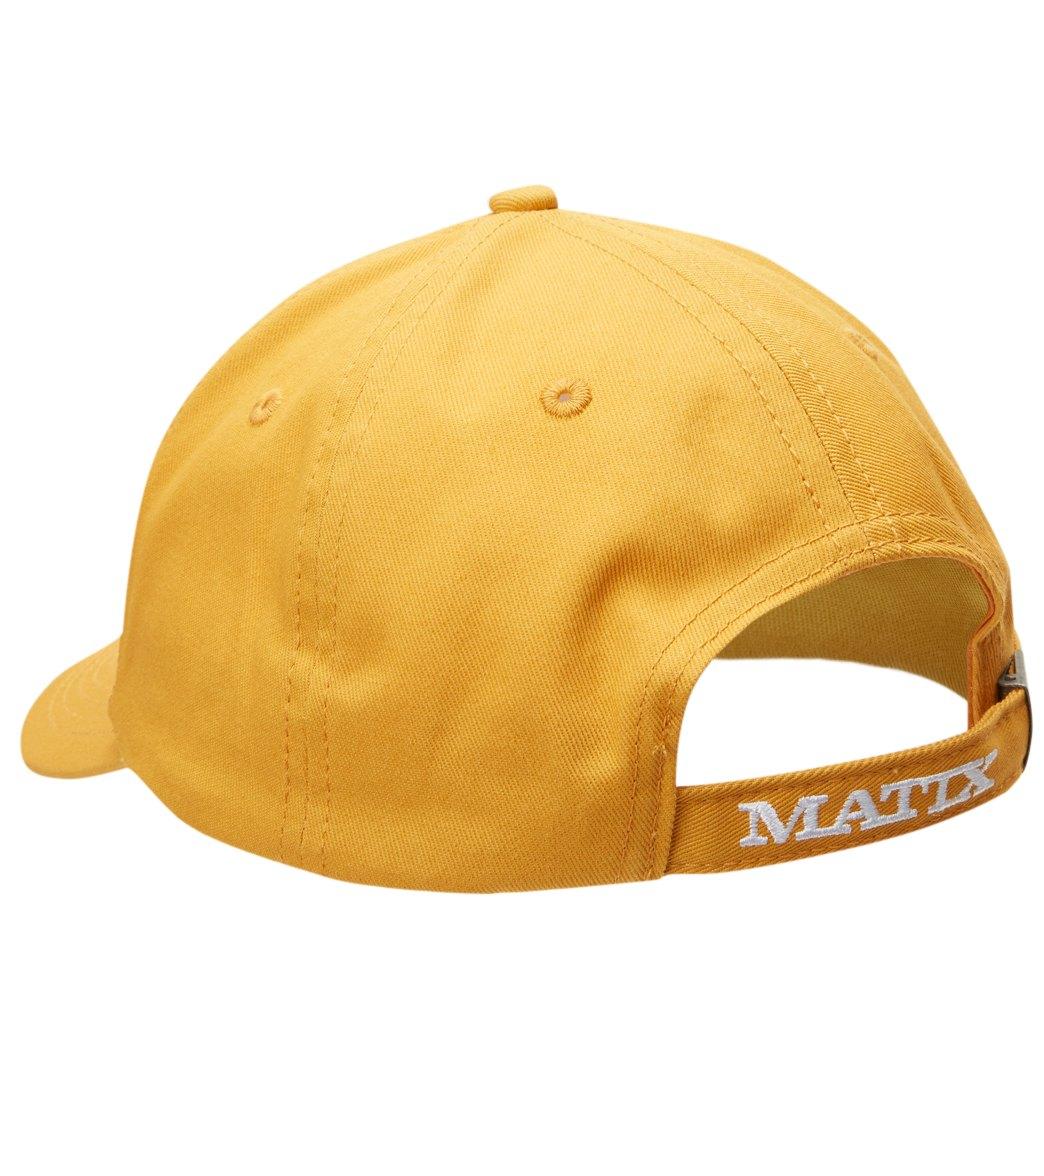 6b7565be Matix Men's Corporate Polo Hat at SwimOutlet.com